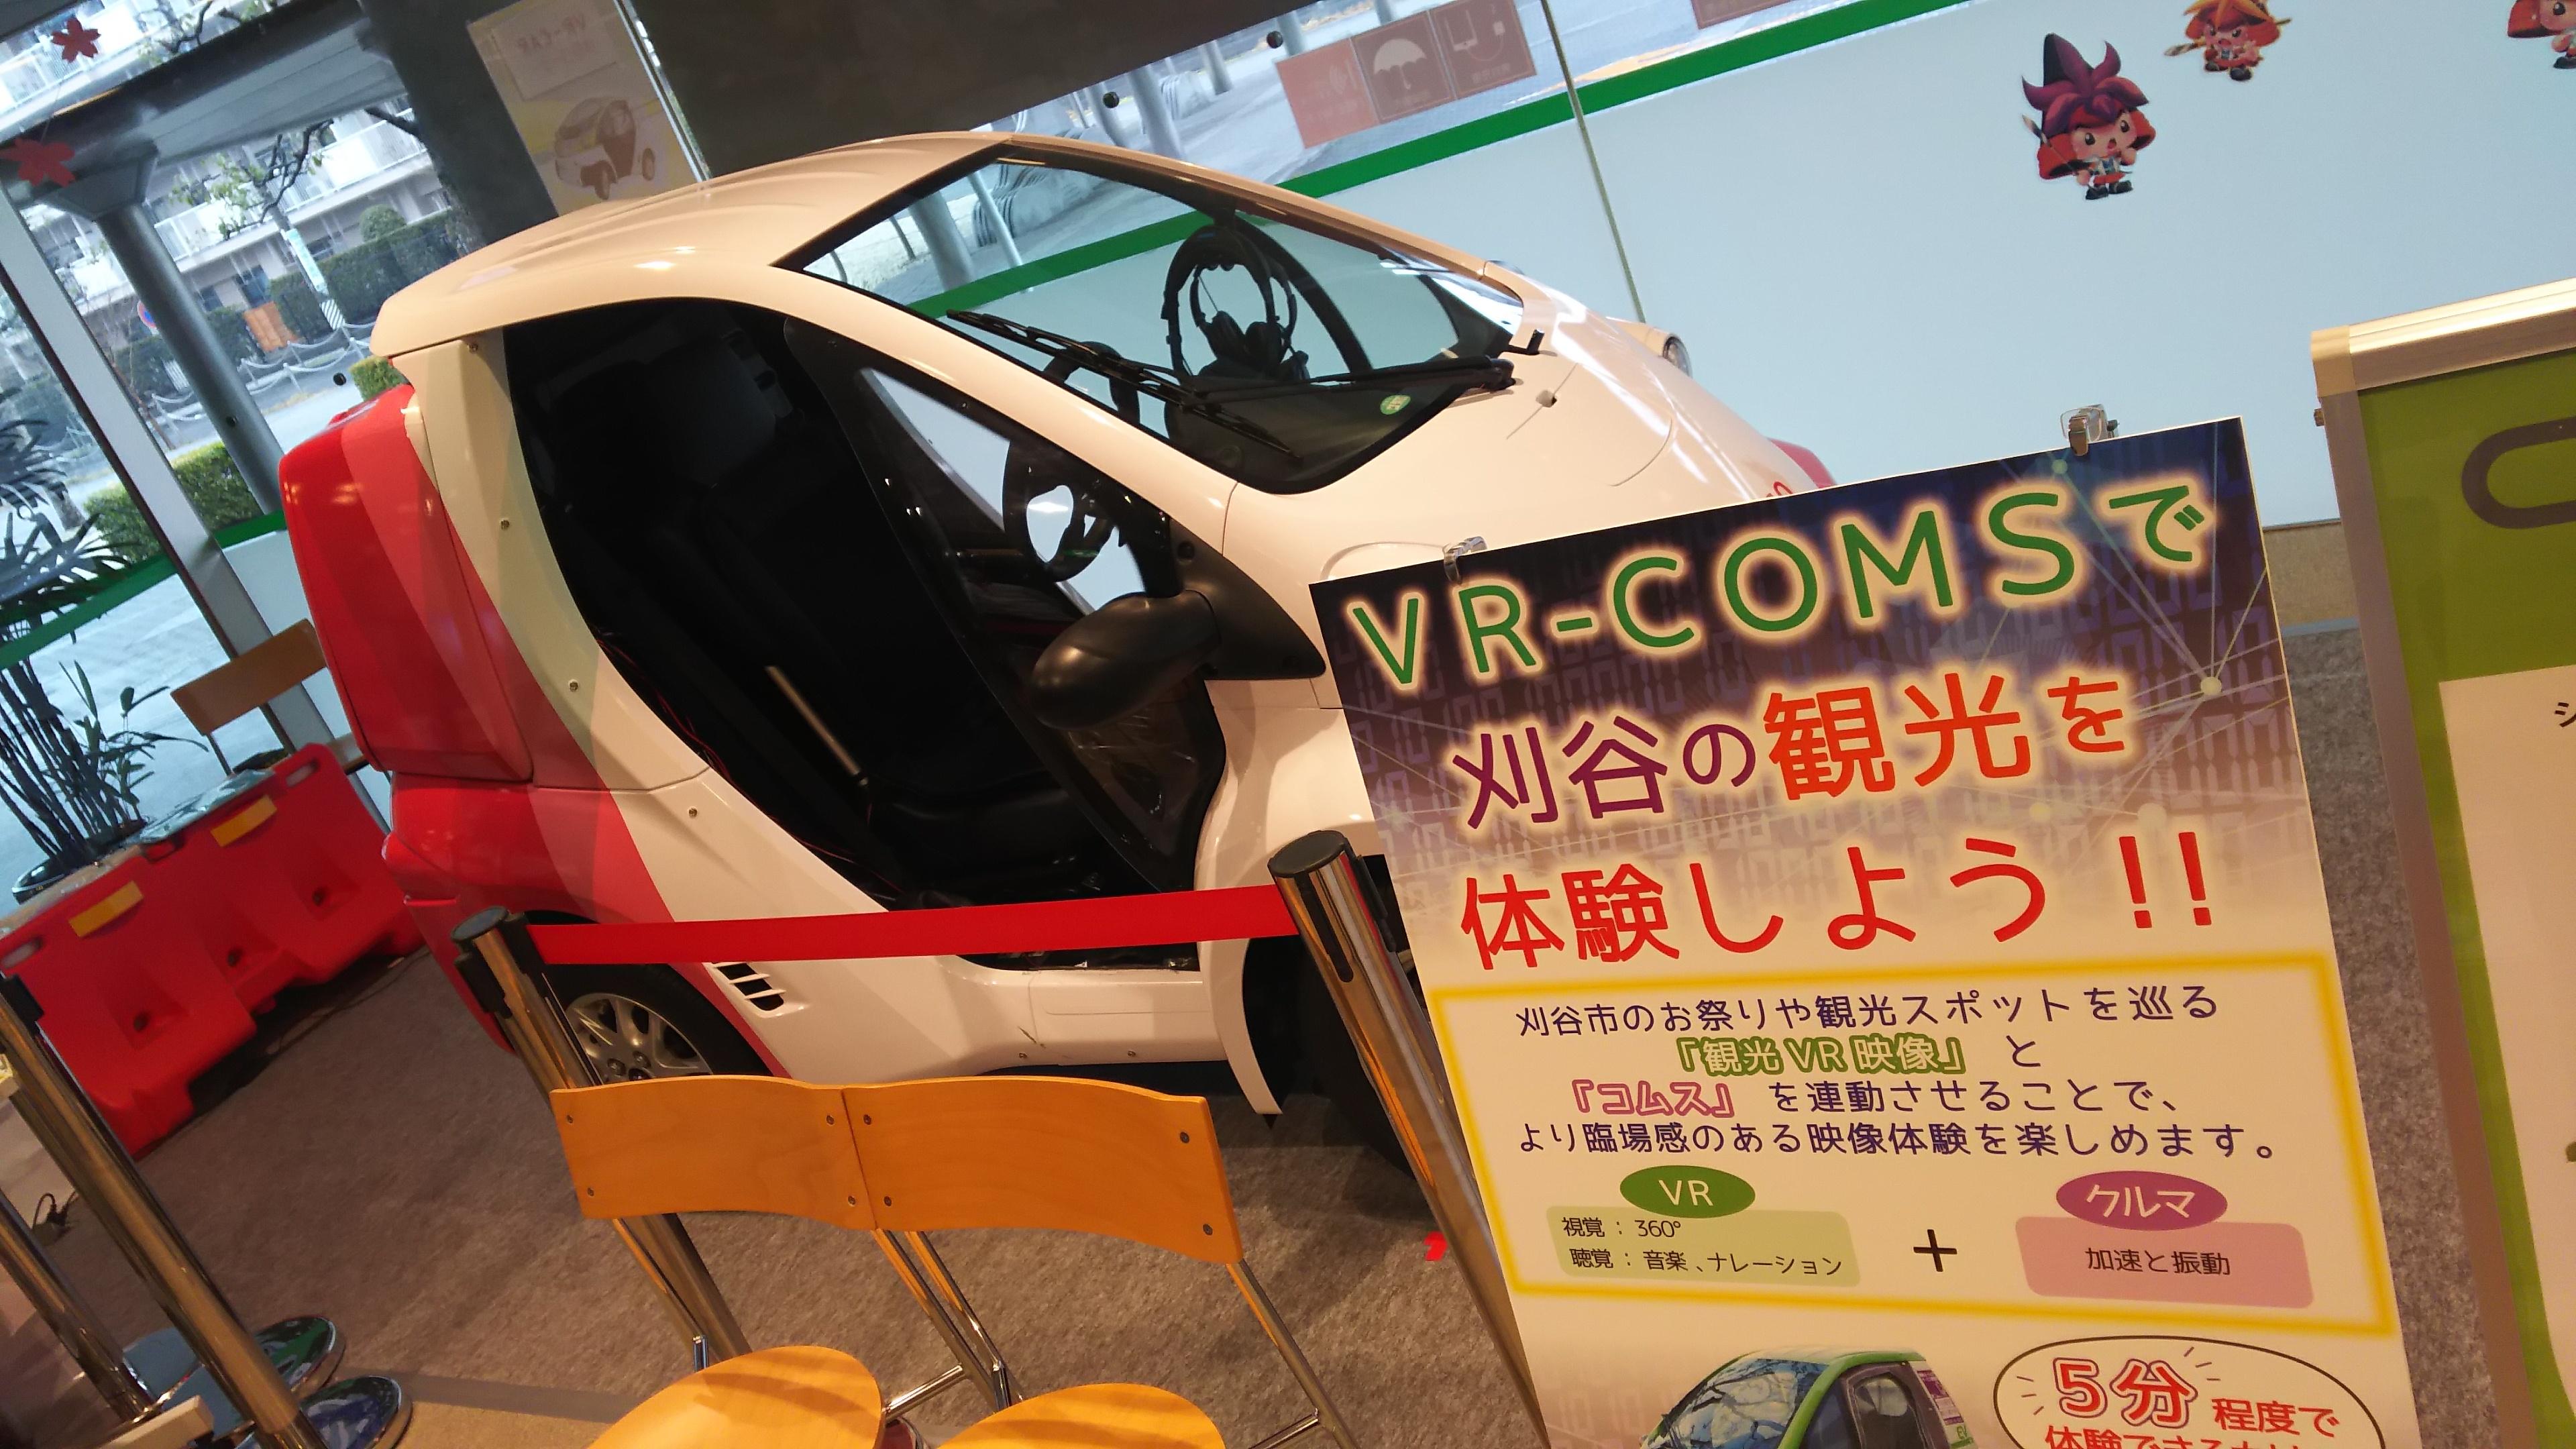 VR-CAR体験やってきました /I did a VR-CAR experience